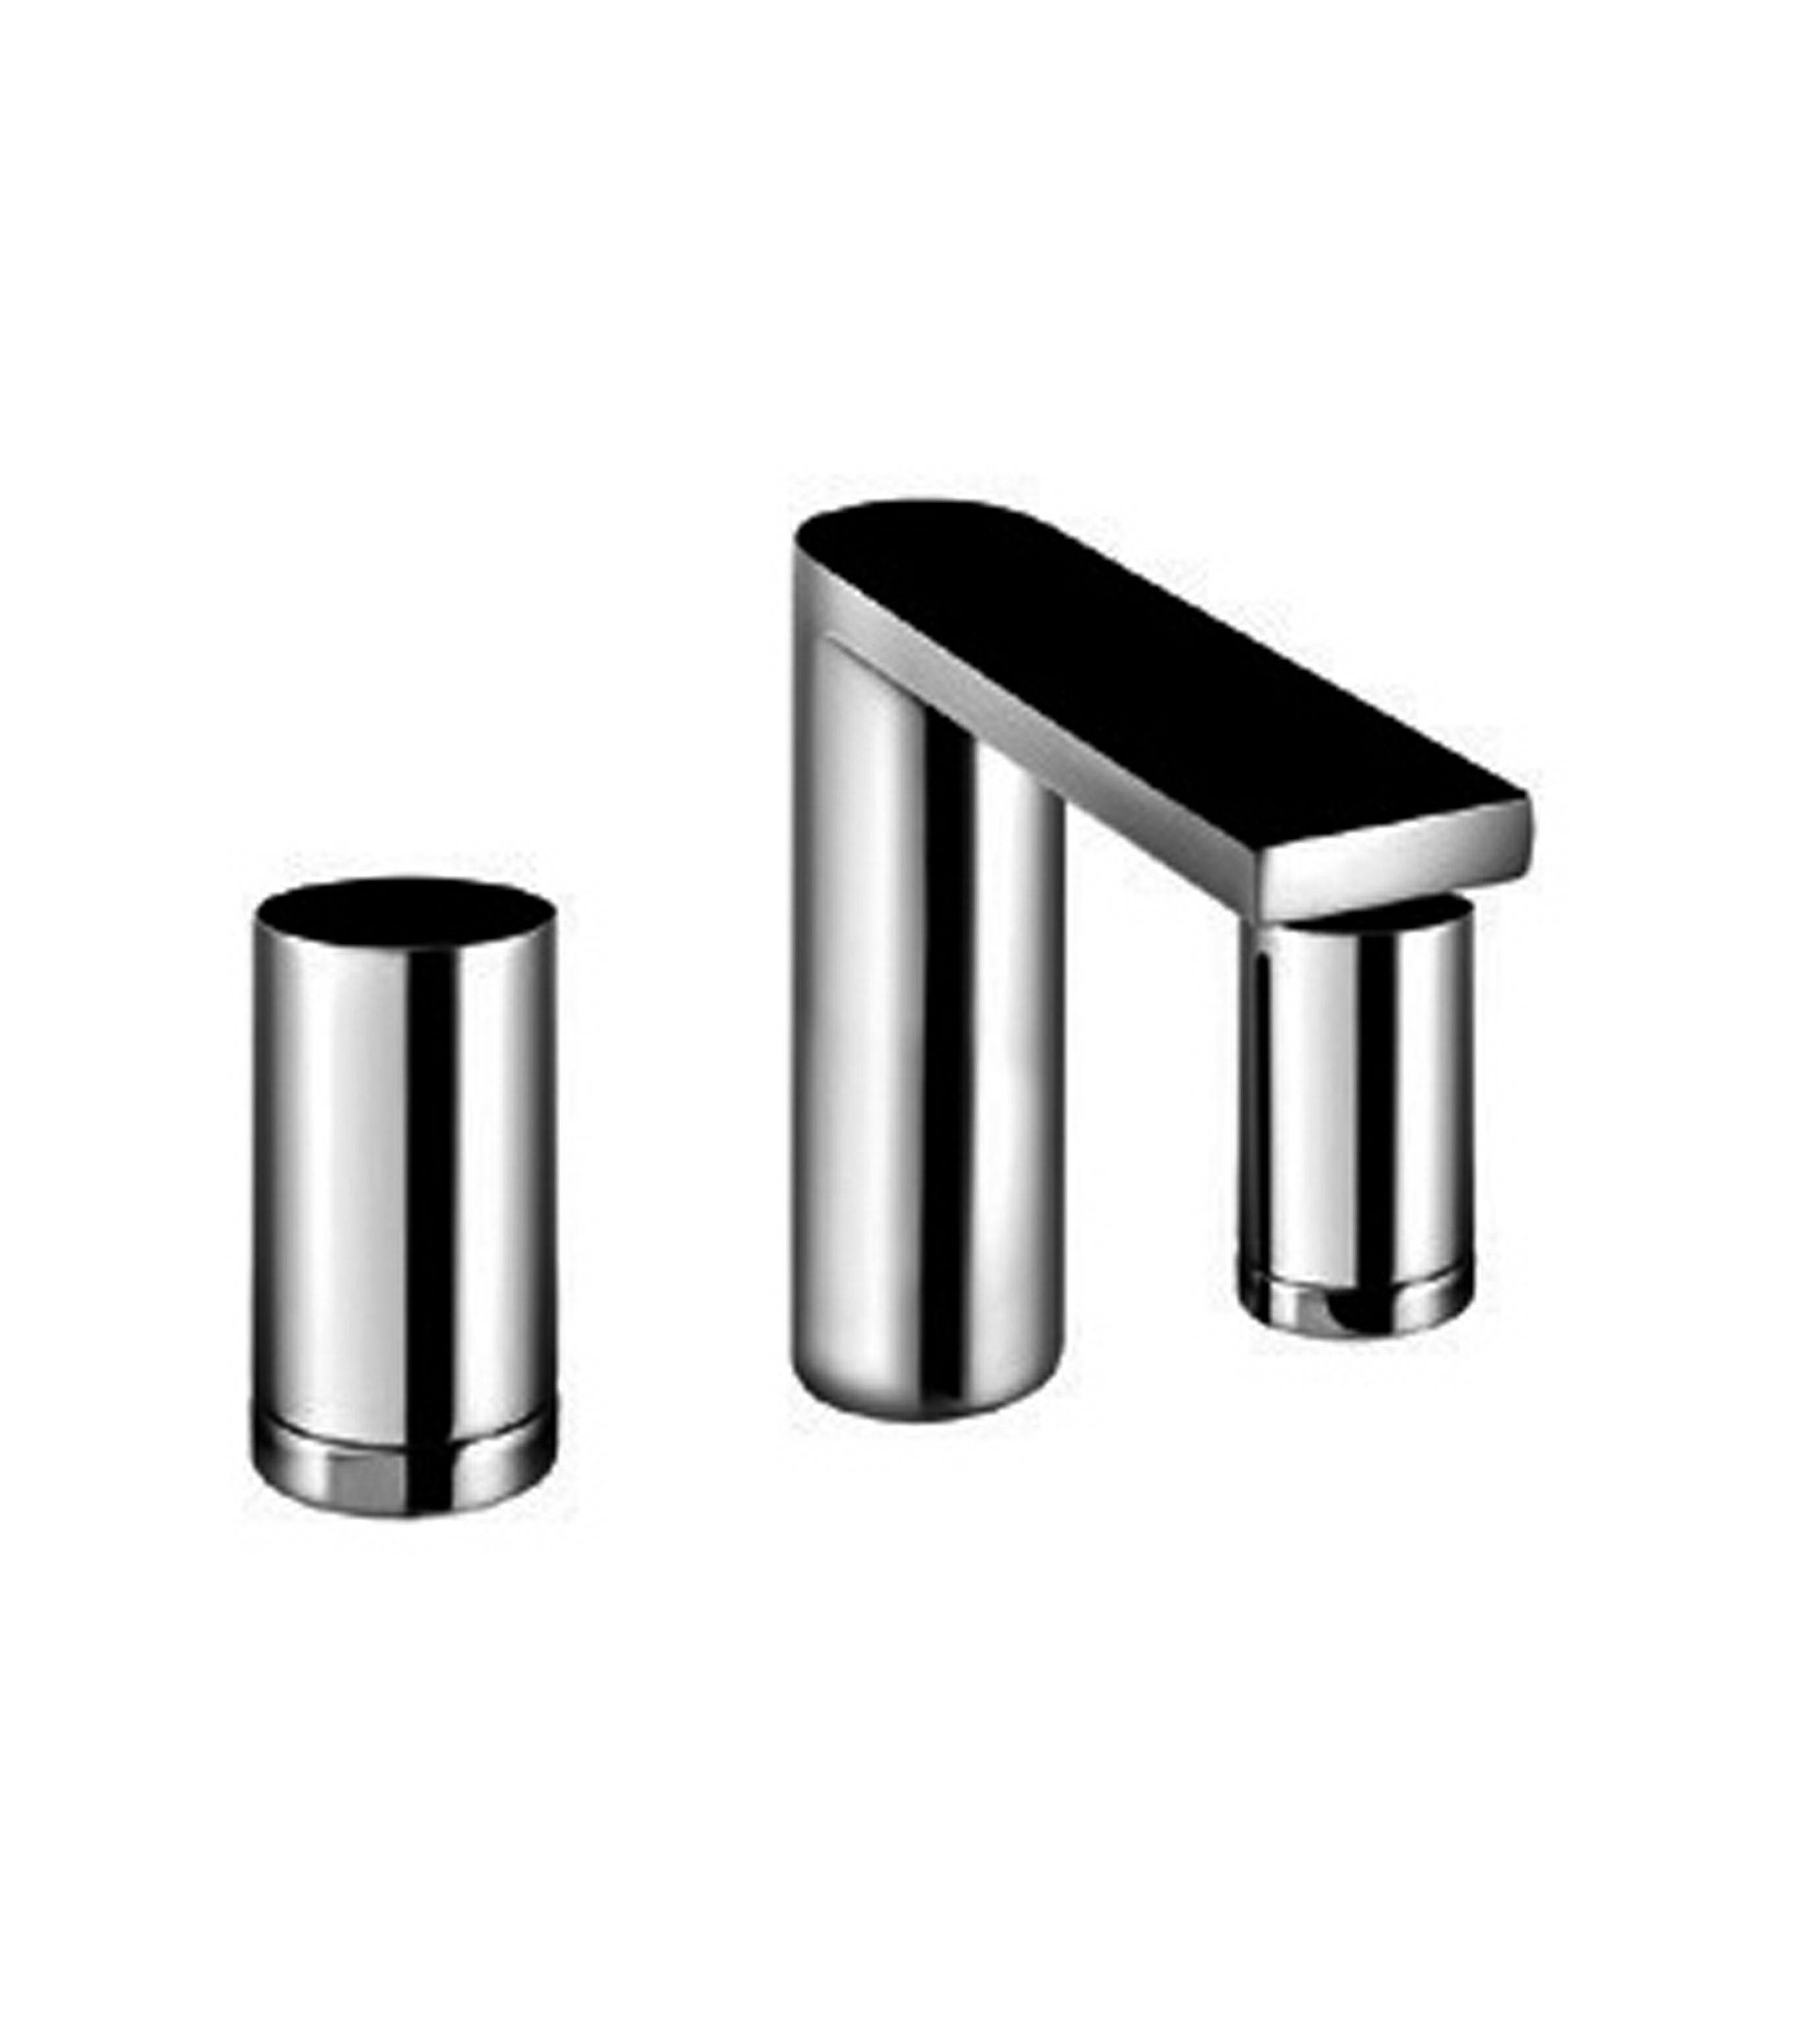 Fantini Milano Stainless Steel